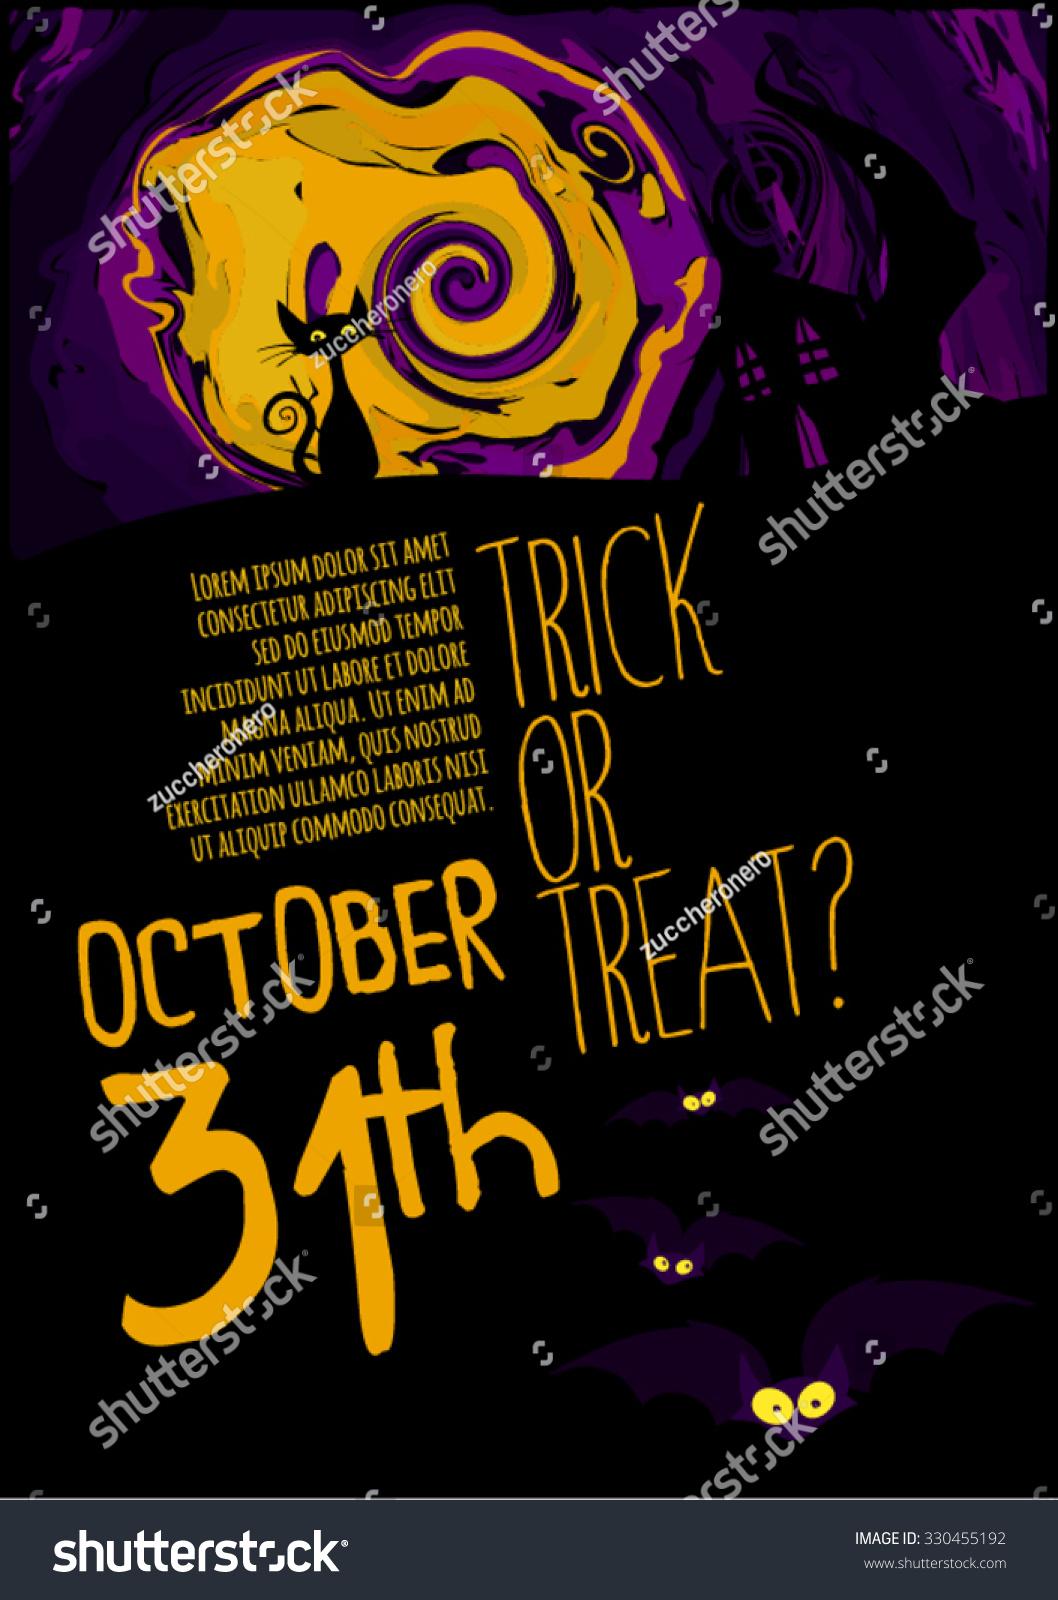 Halloween Party Flyer Halloween Poster Layout Stock Vector ...